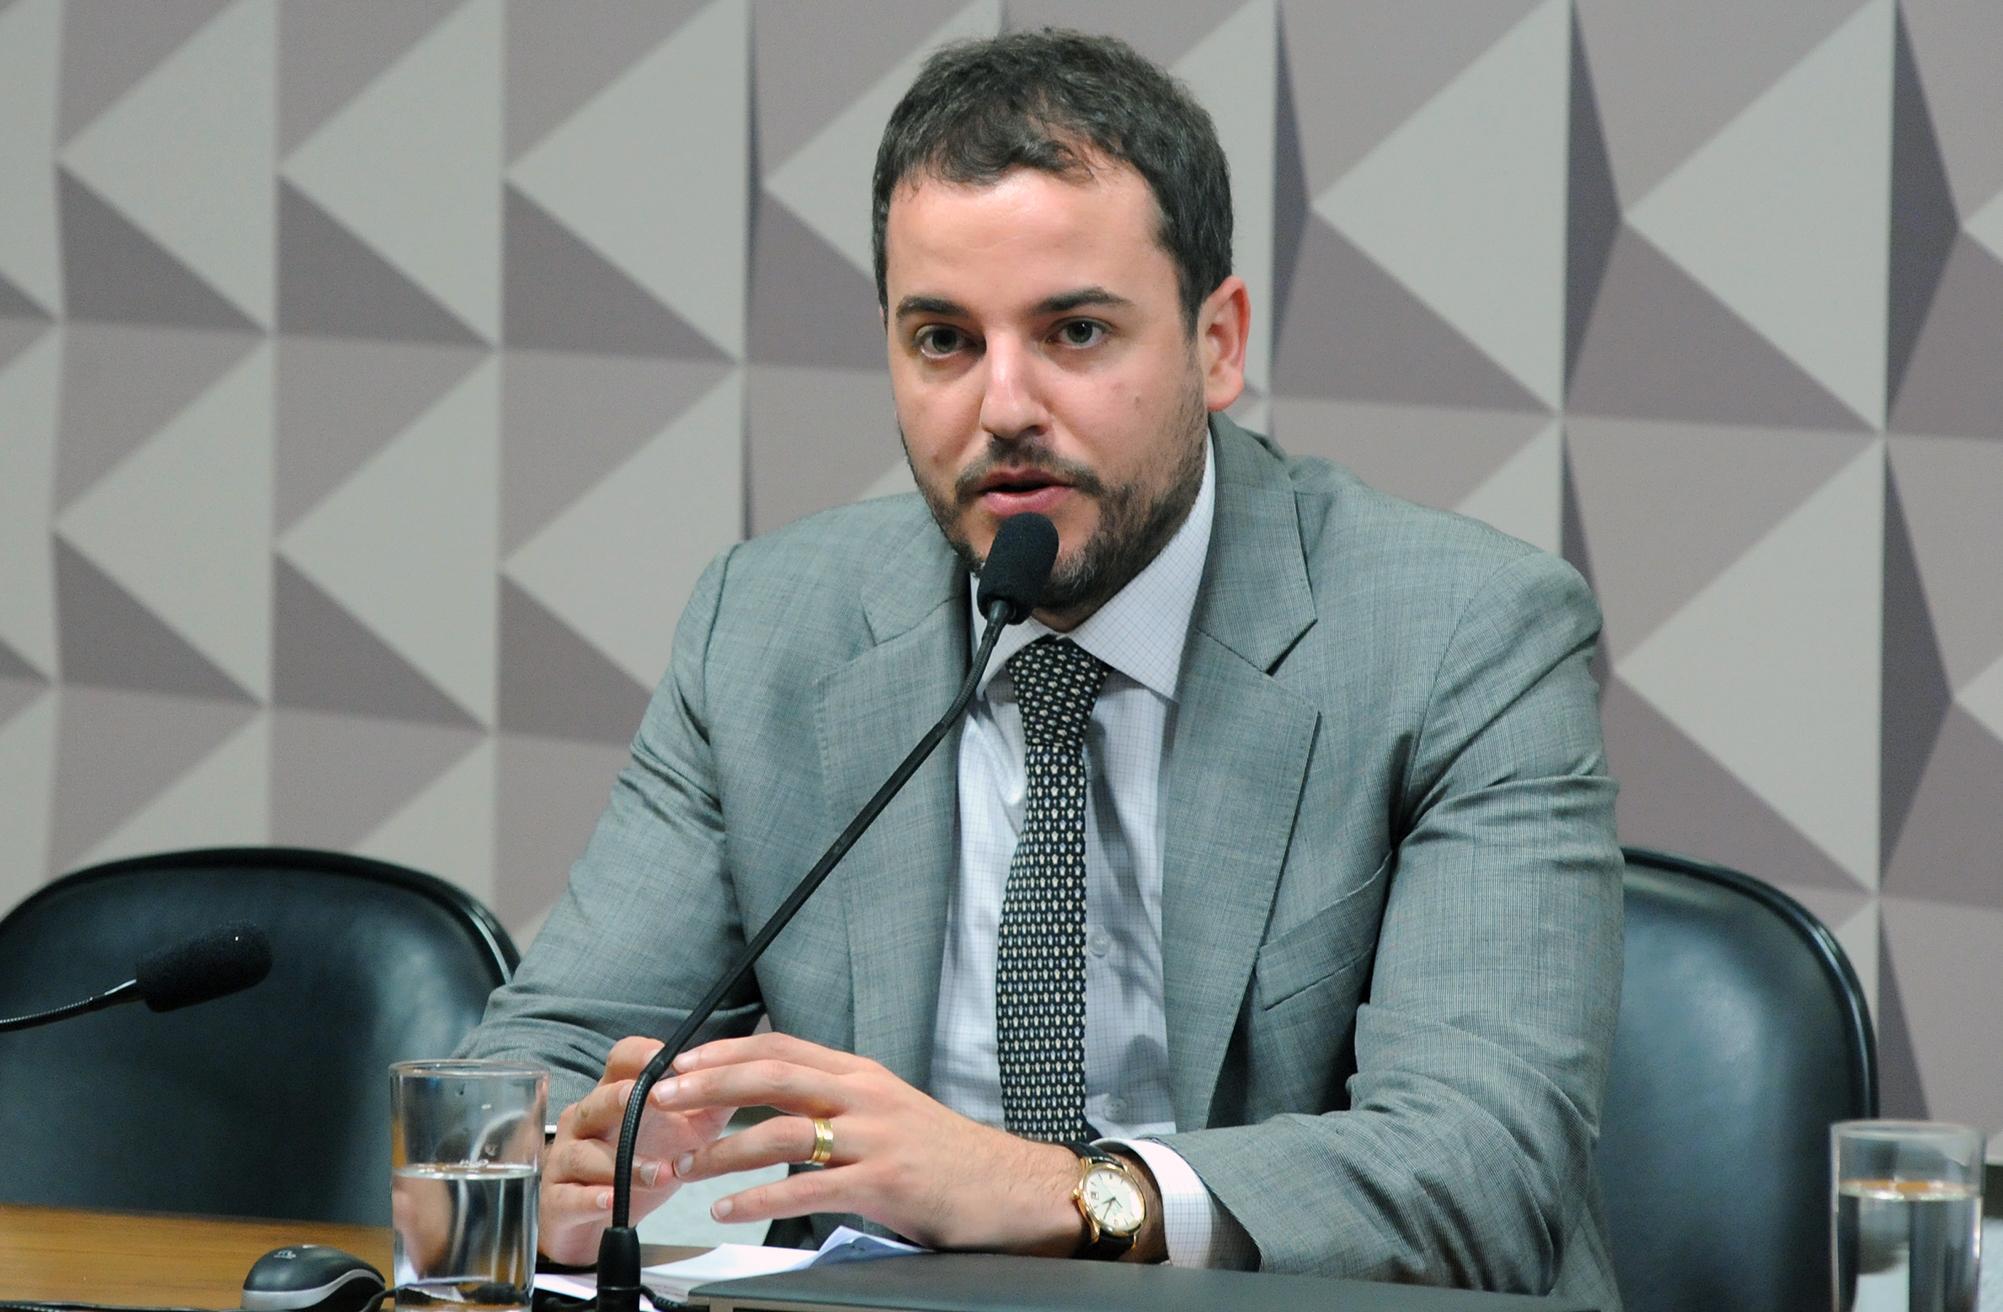 Comissão Mista sobre a MP 773/17. Dep. Gabriel Guimarães (PT - MG)